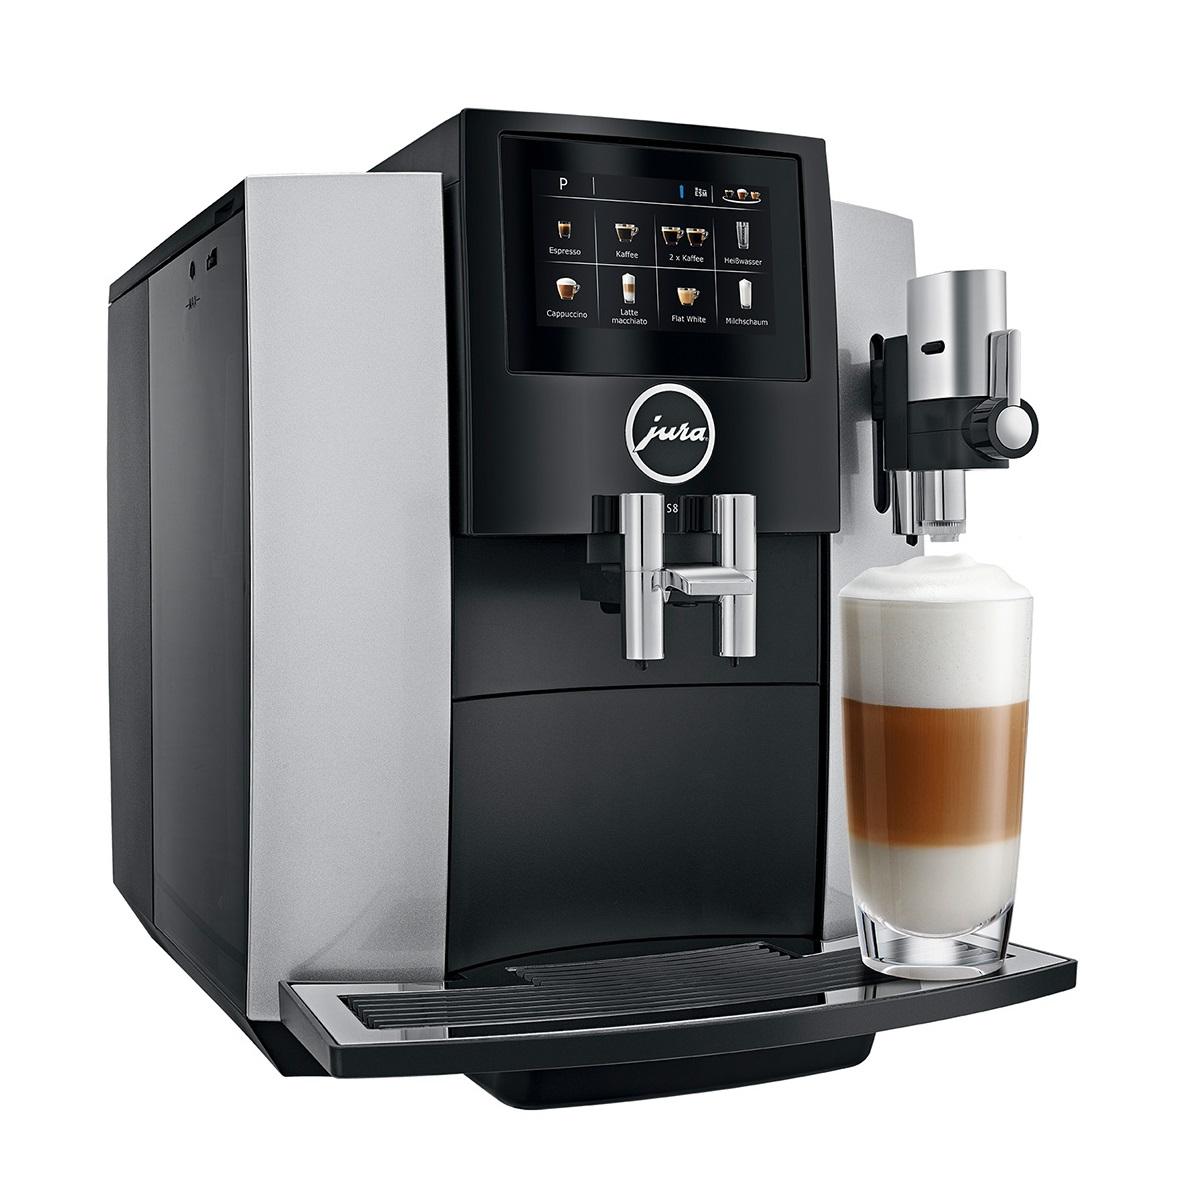 Espressor automat Jura S8, 15 bari, 1.9 l, 280g, rasnita AromaG3, 15 specialitati One Touch, touchscreen, Silver+ cadou cafea